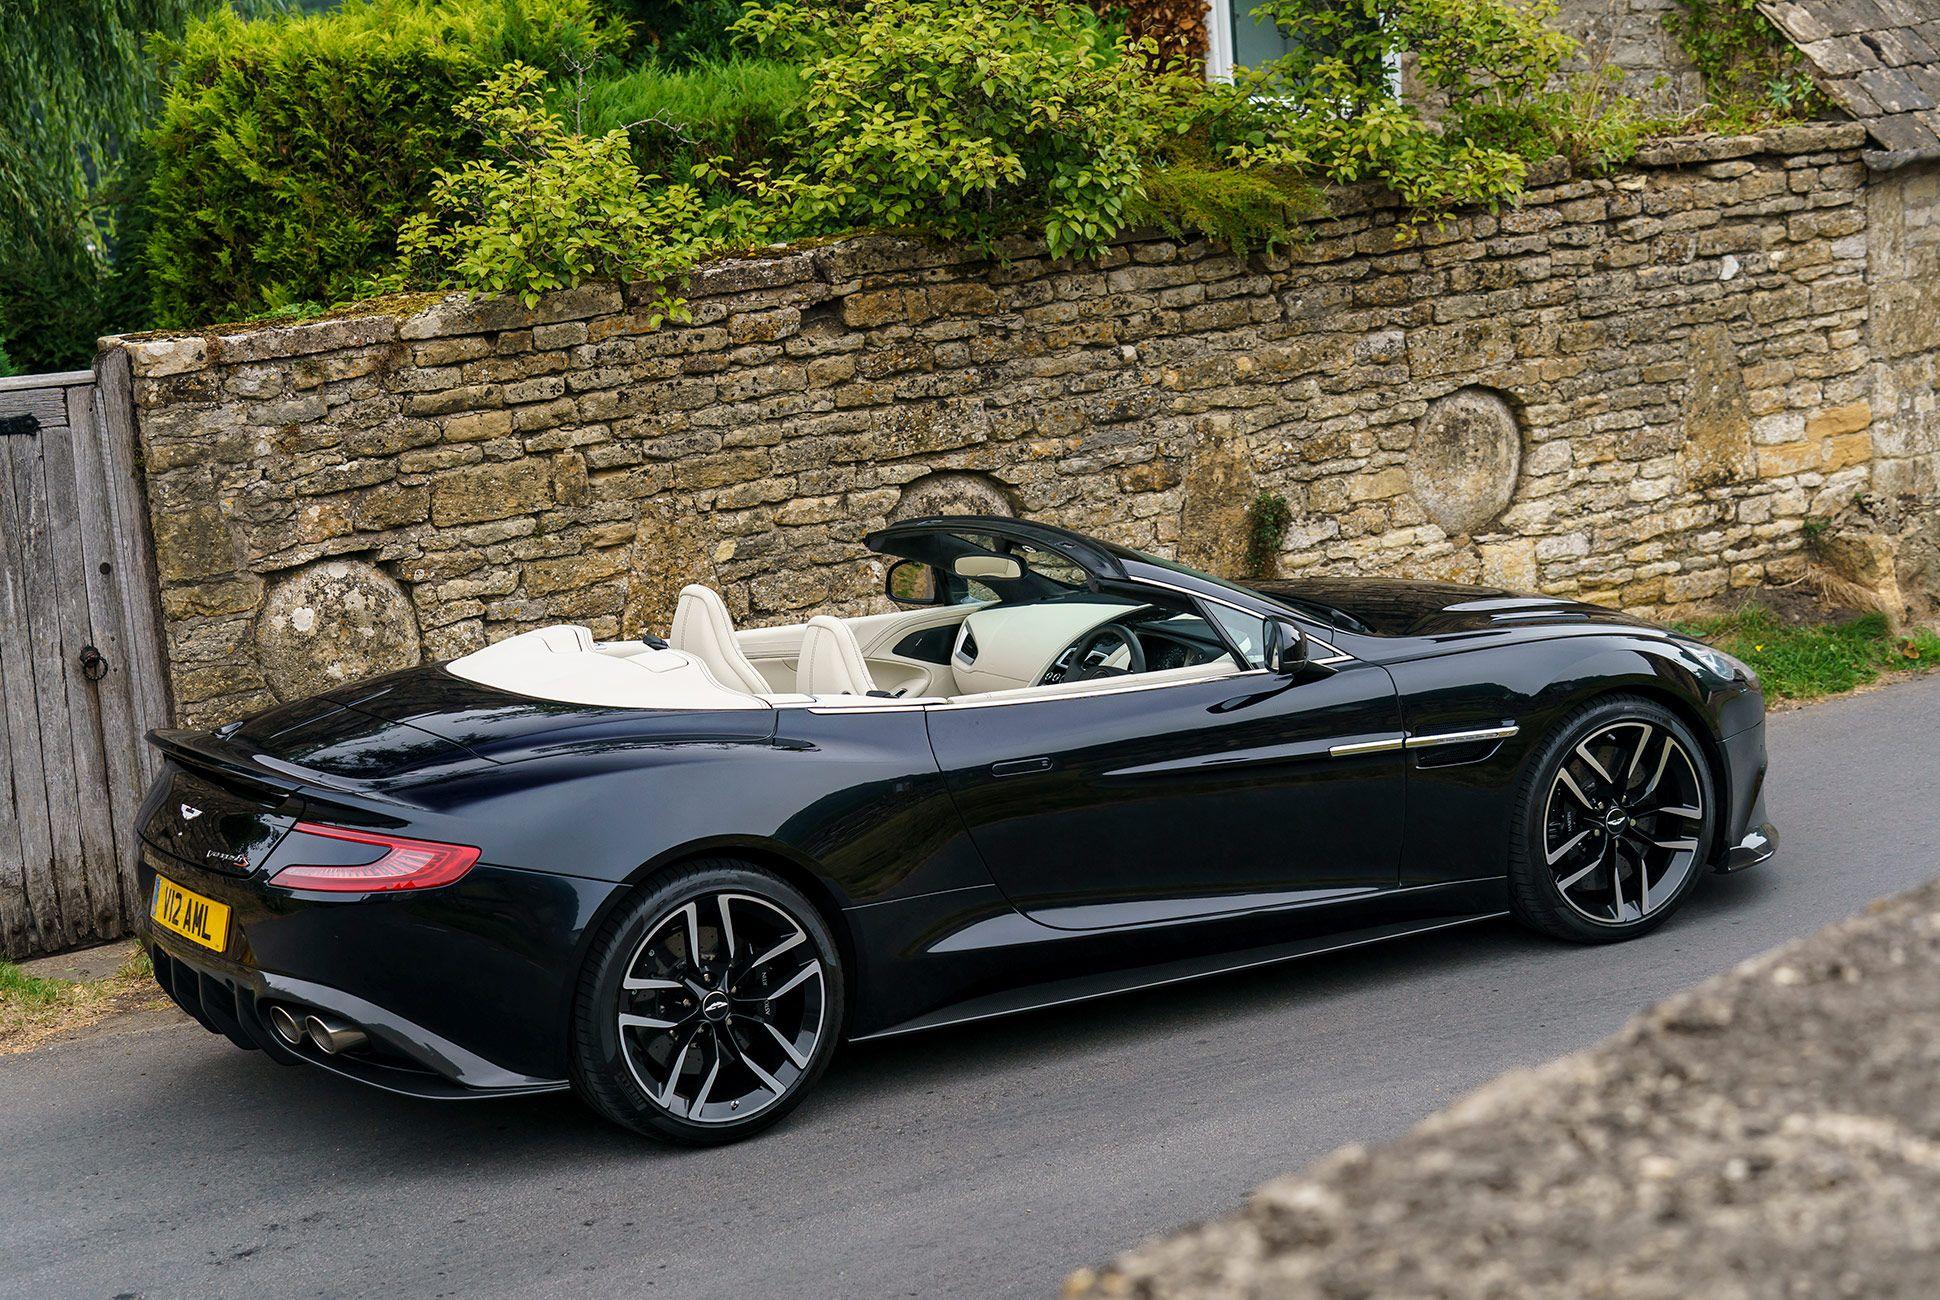 Meet The Terrifyingly Brilliant Last Of The Old World Aston